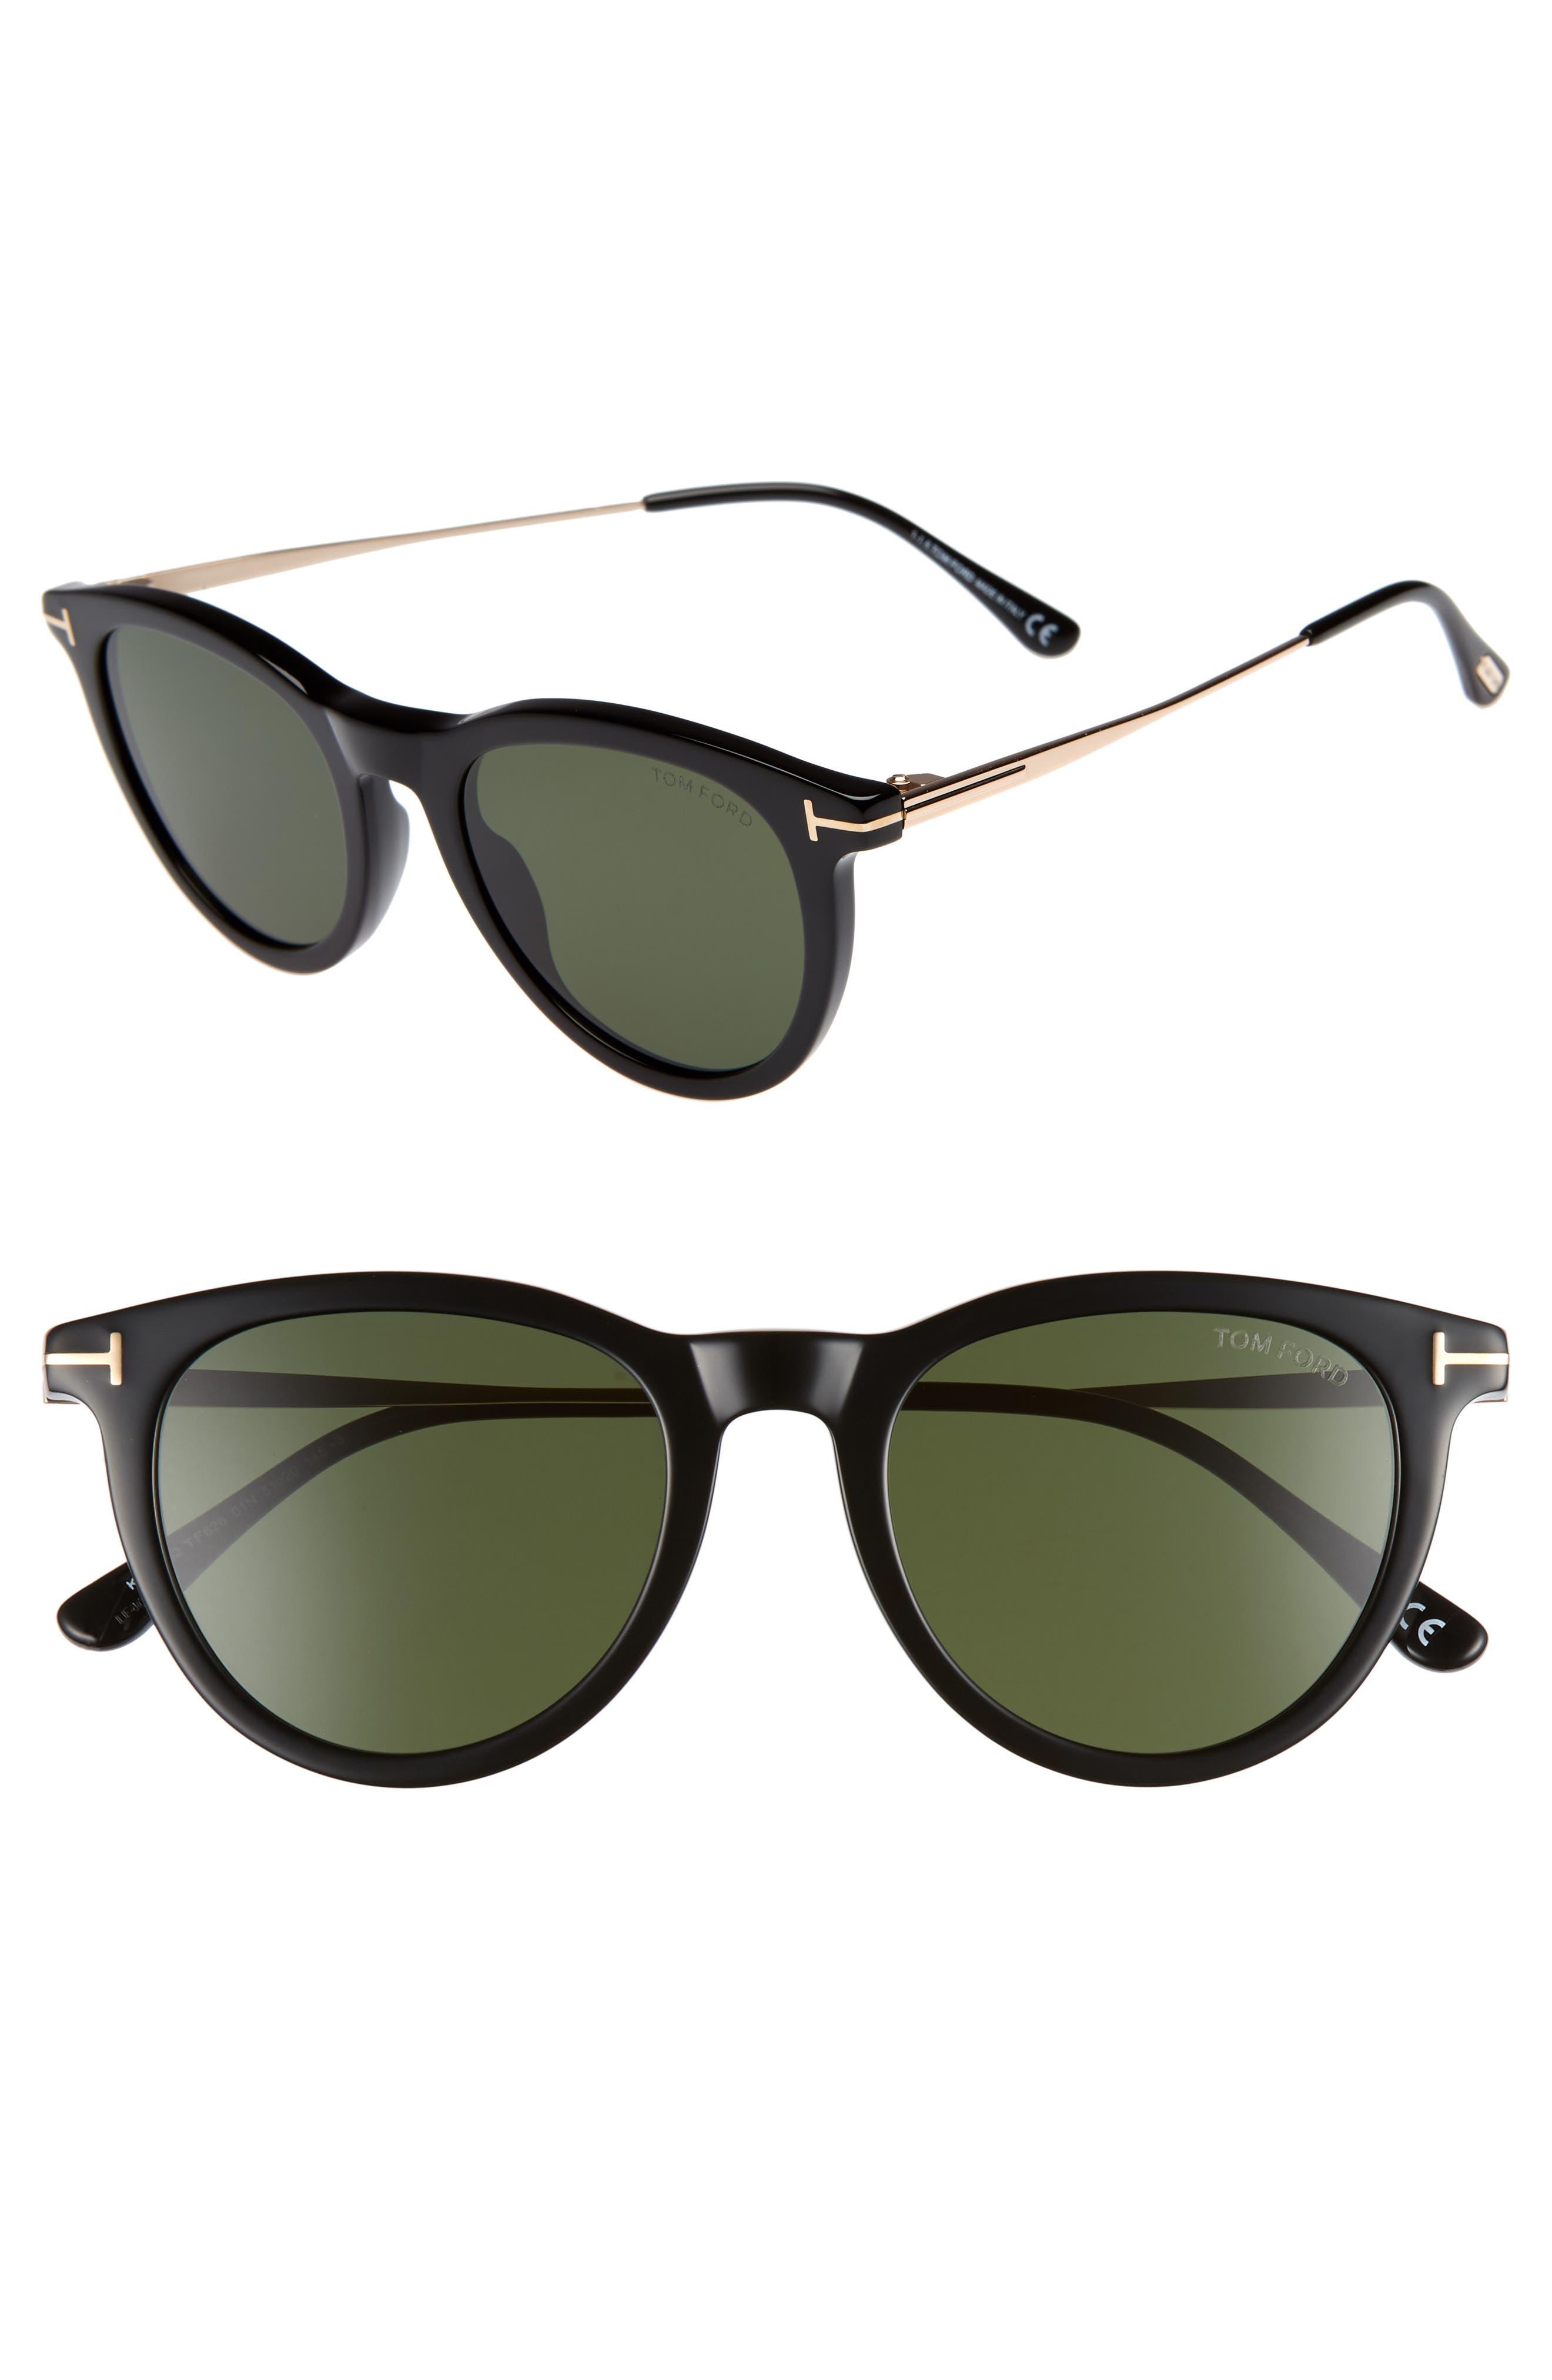 67a69e7652f4 Women s Tom Ford Cat-Eye Sunglasses